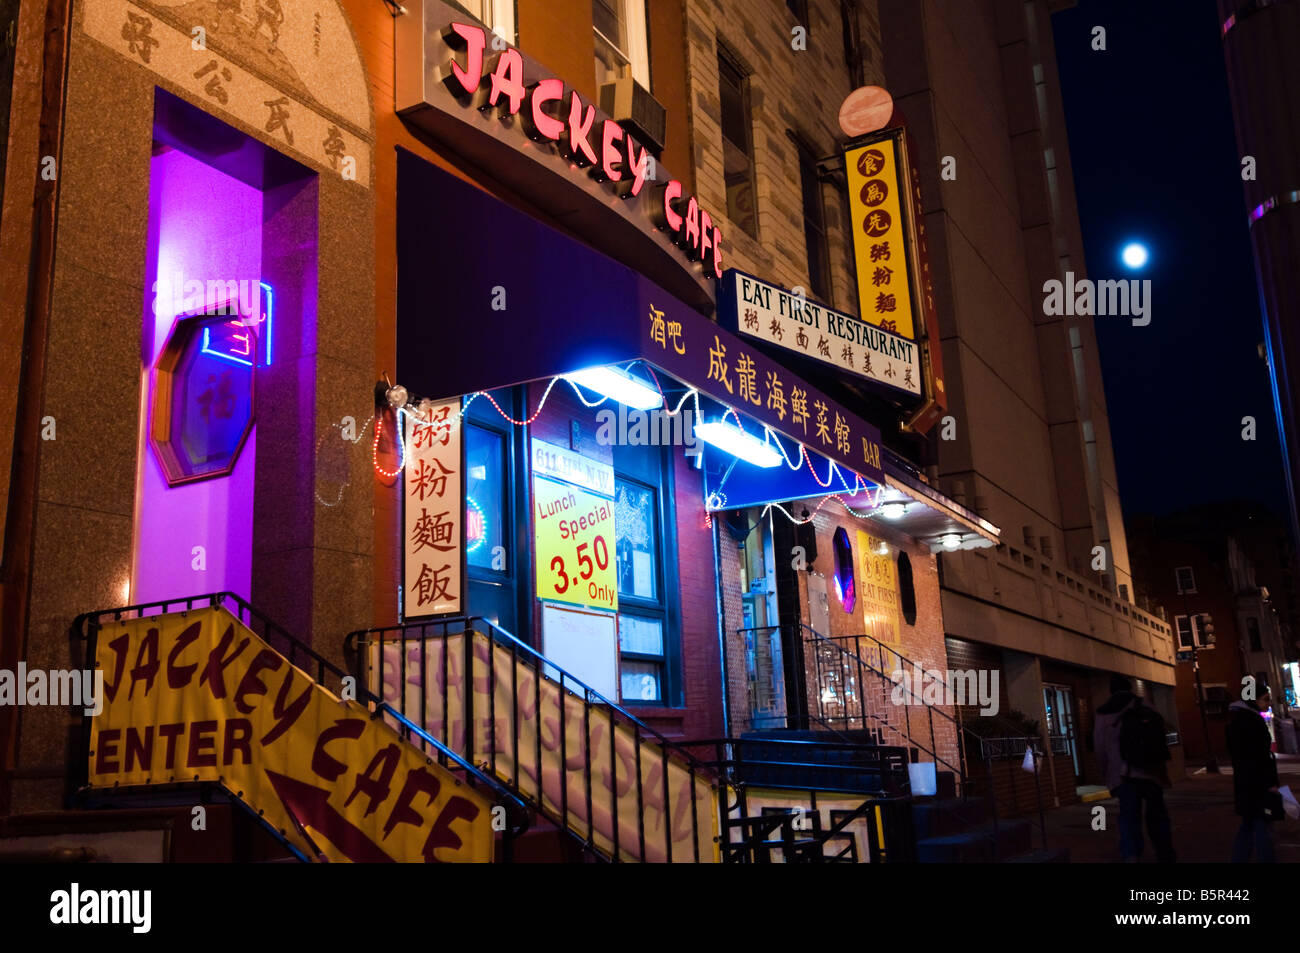 A Night Scene Of Washington Dc S Chinatown With Restaurants